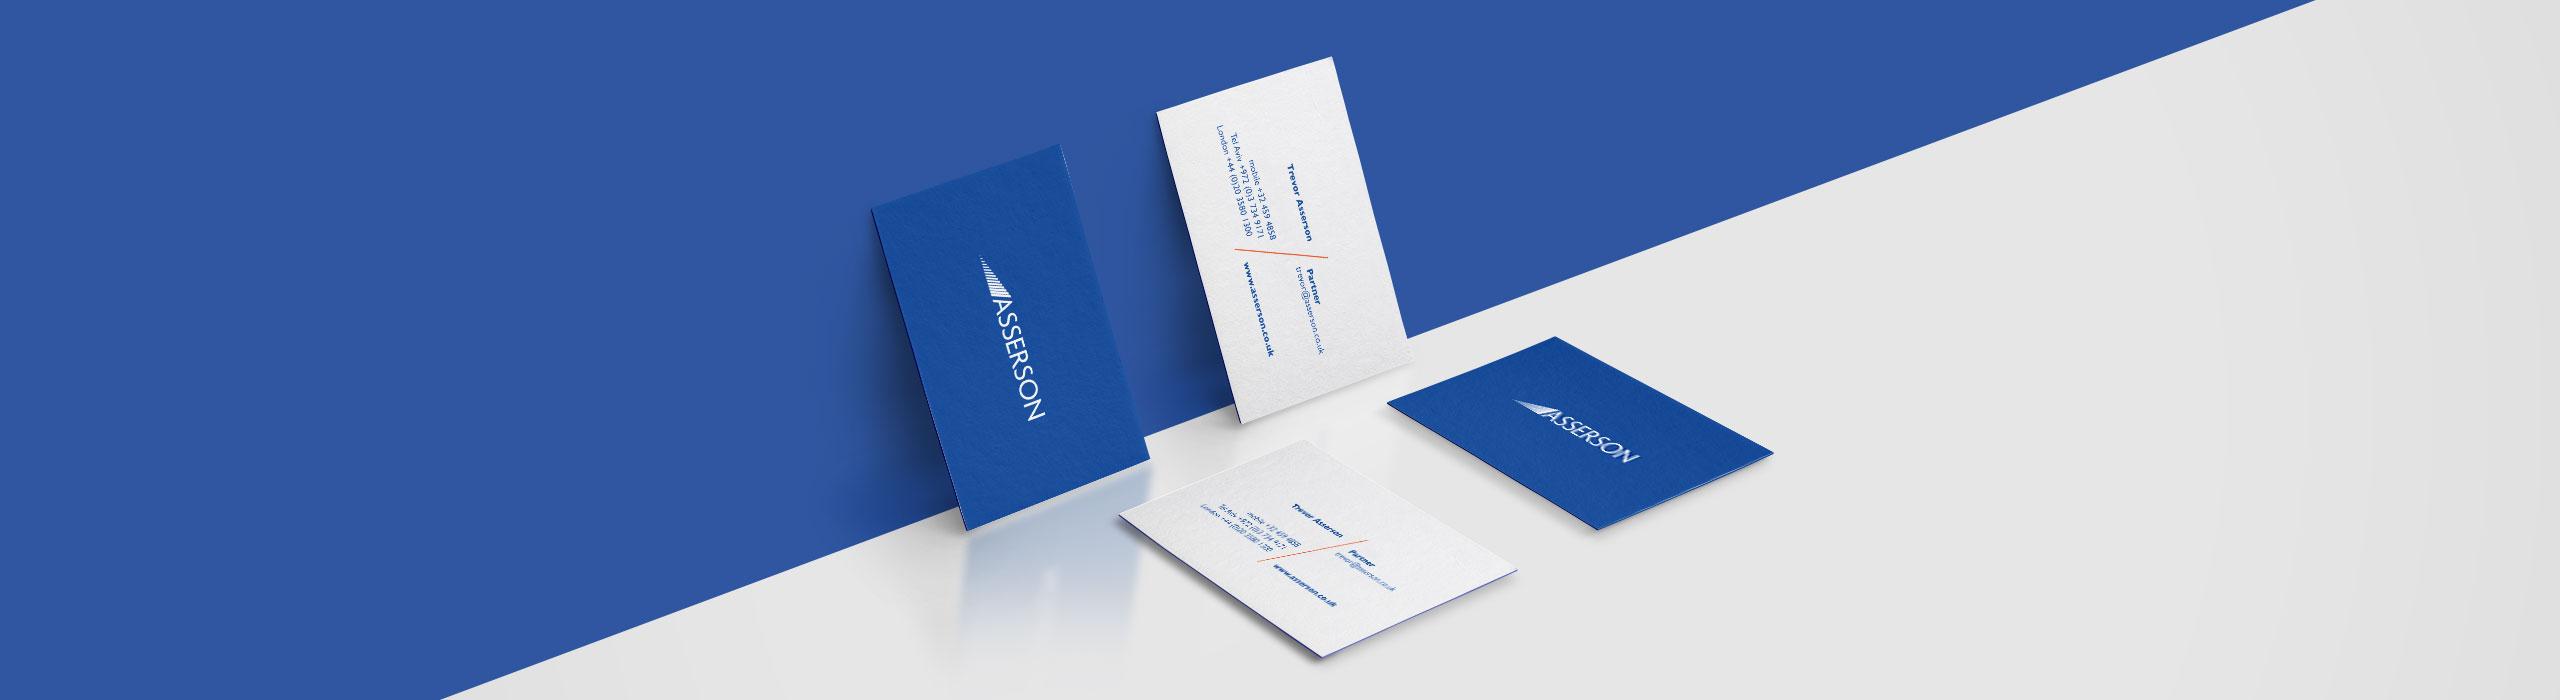 Asserson - natie-asserson-business-cards - Natie Branding Agency